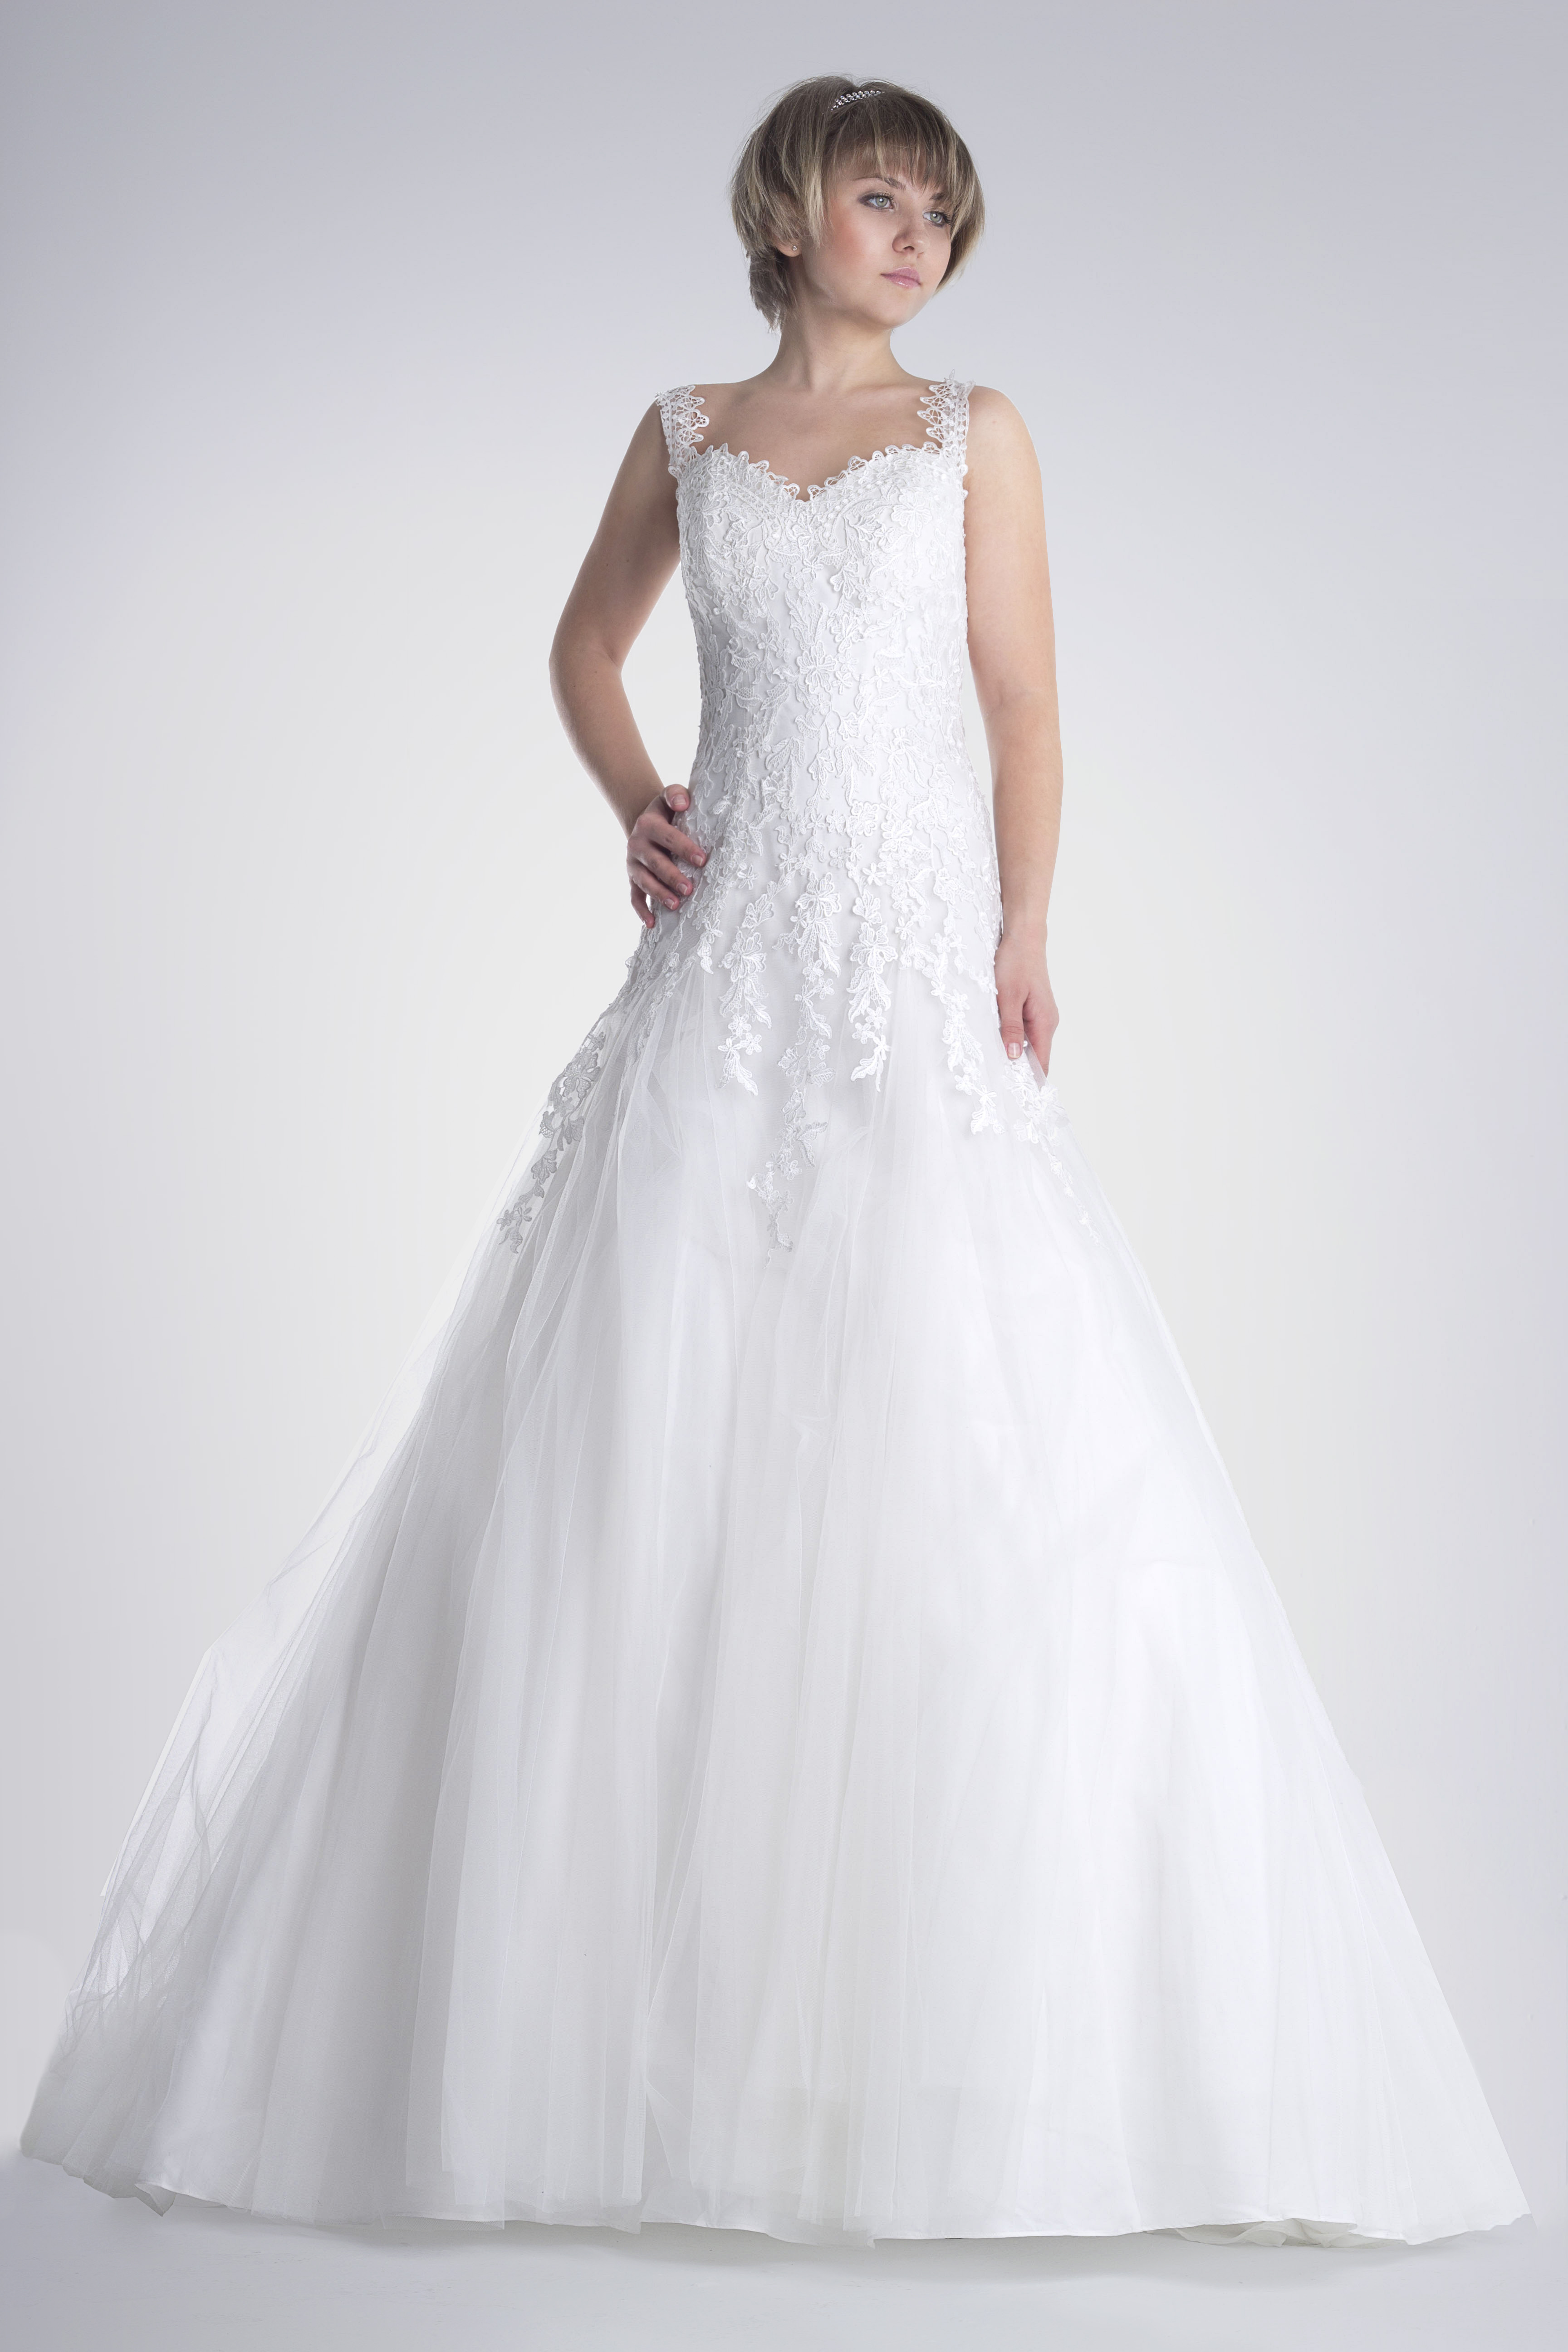 "5ee34c3a2 Celeste. ""Perteneciente al cielo"". CELESTE (1) Vestido de novia en renta o  alquiler de Innovias modelo ..."